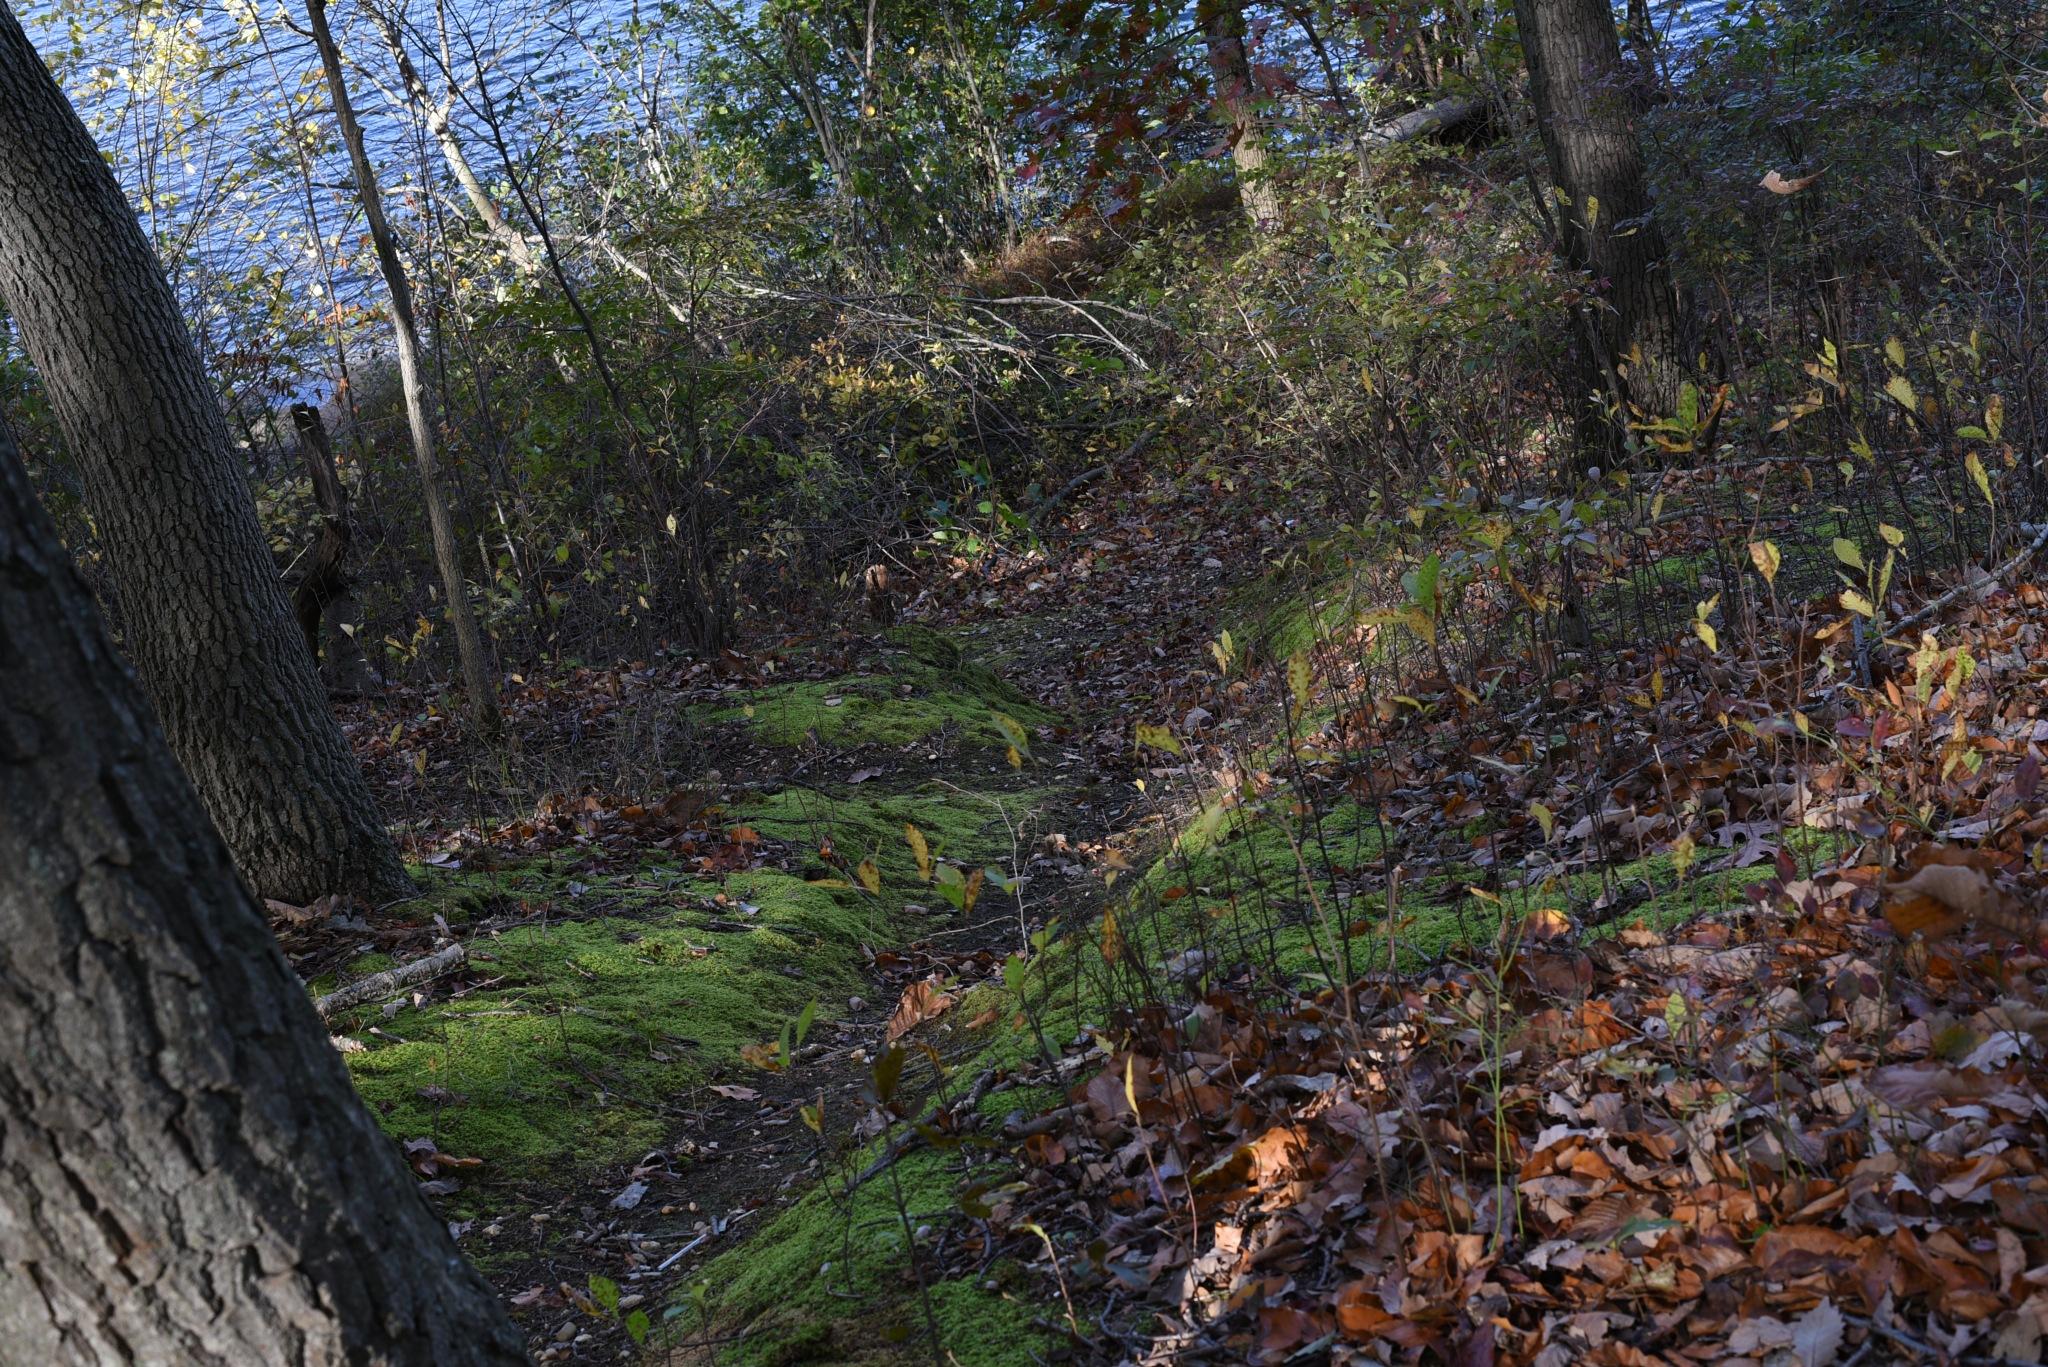 Photography Class - Treacherous Path to the Lakeside by Vizzpat